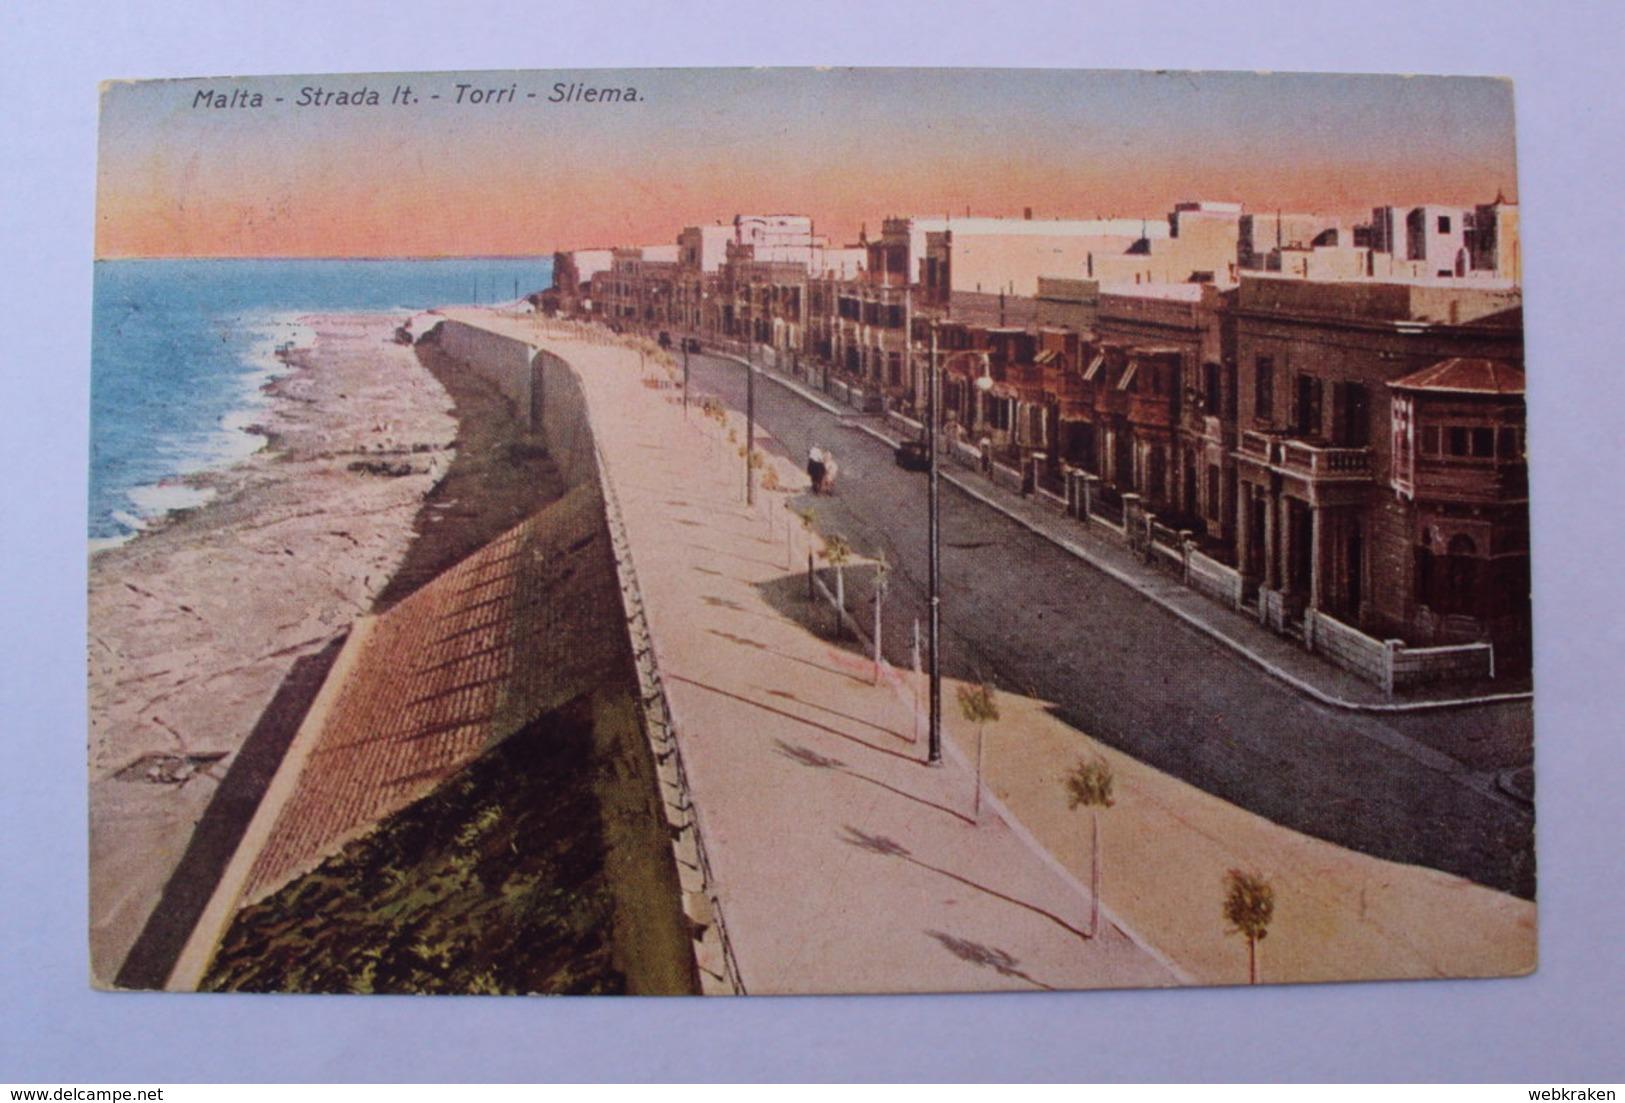 STORIA POSTALE CARTOLINA DA MALTA ANNULLATA A SIRACUSA ITALIA 1930 - Malta